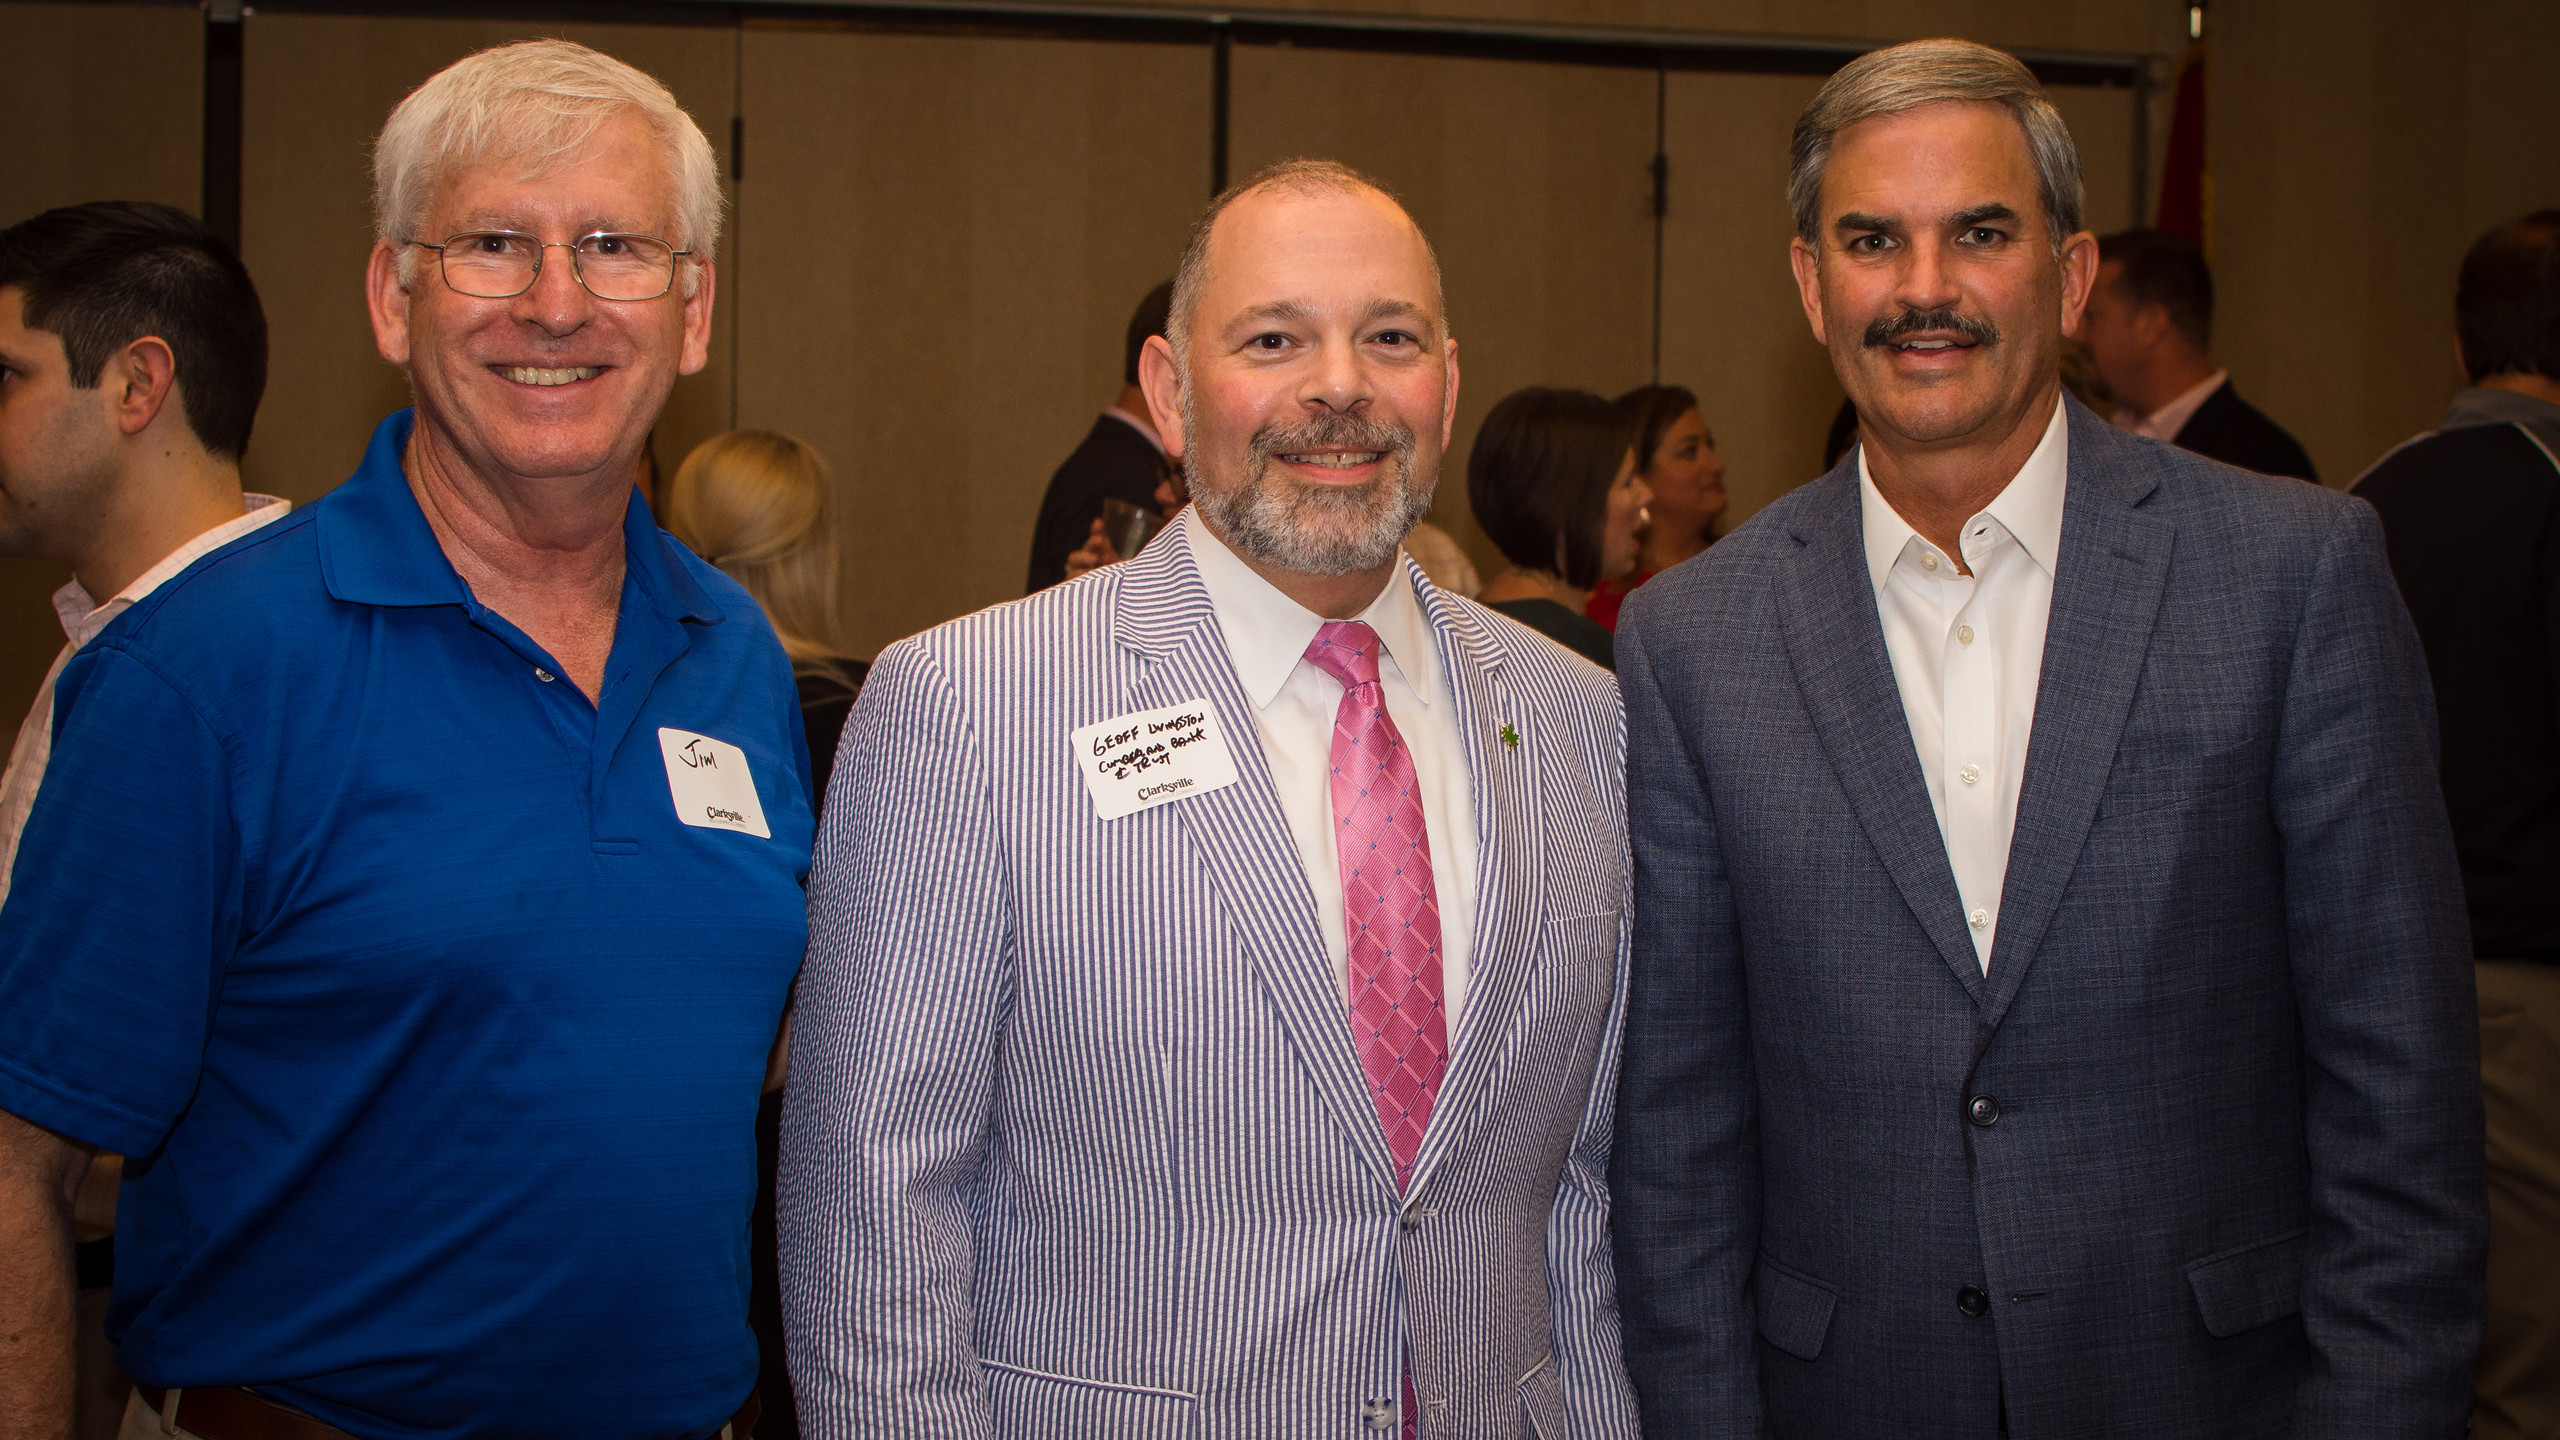 Jim Jay, Geoff Livingston, and Charlie K